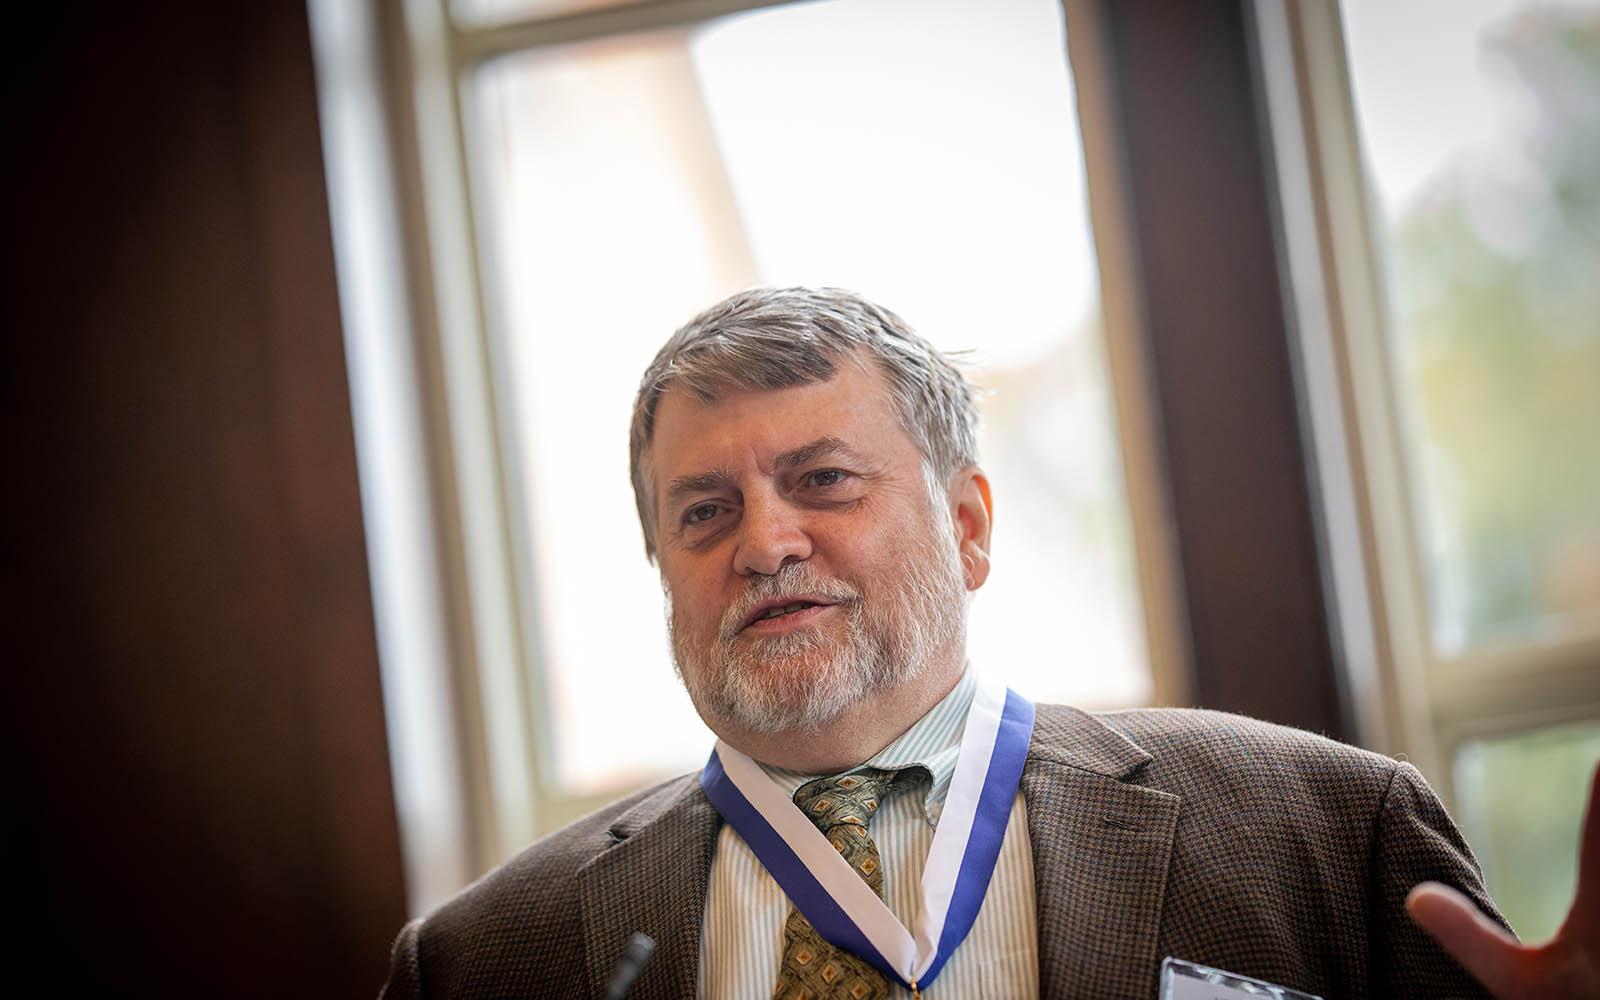 Professor Kevin McEvoy